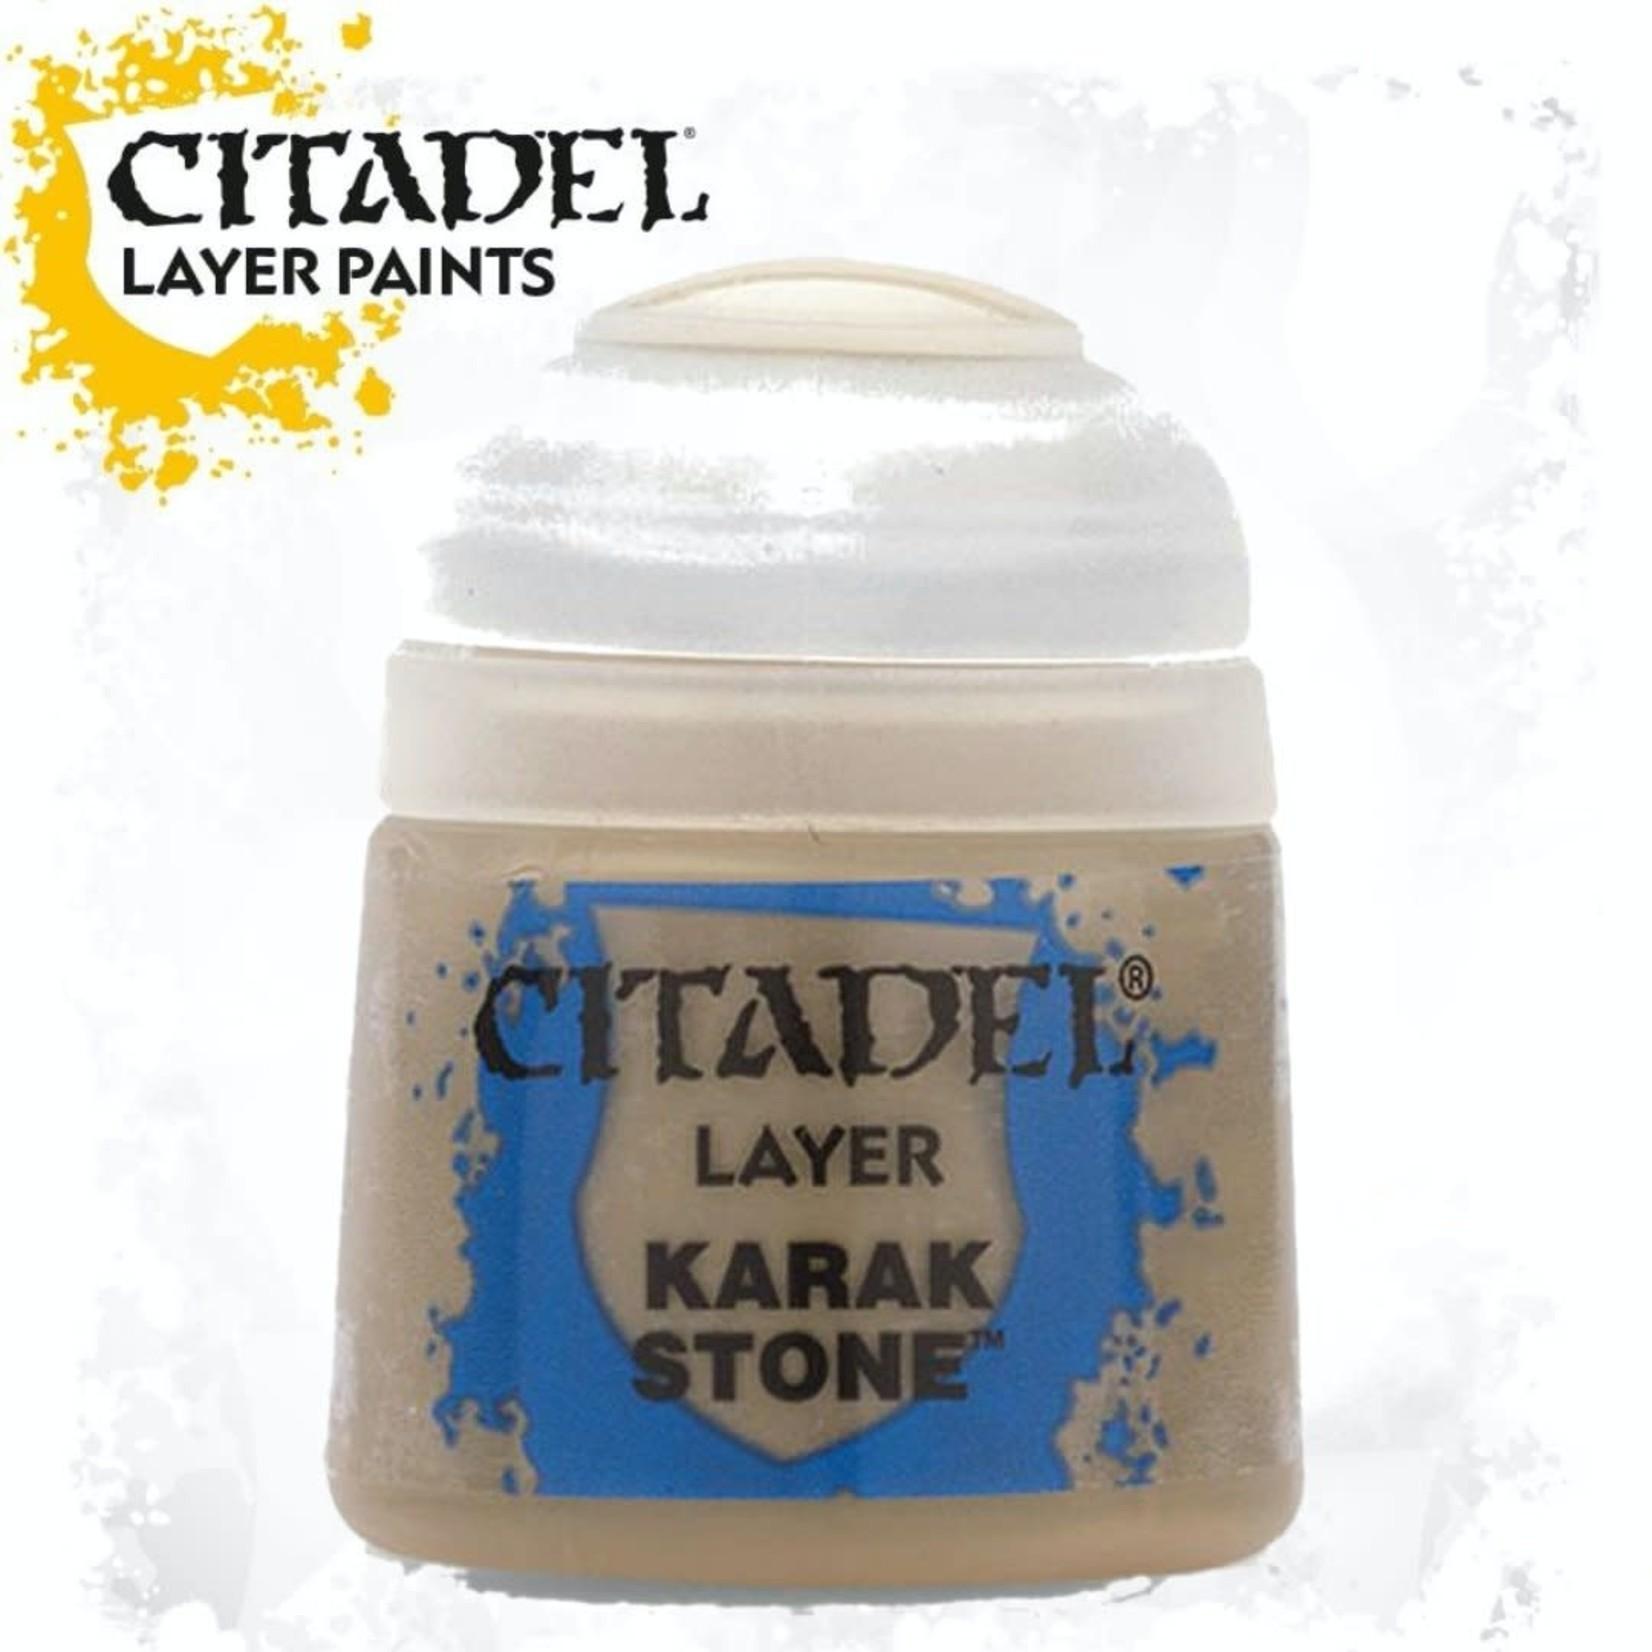 Citadel Citadel Paint - Layer: Karak Stone